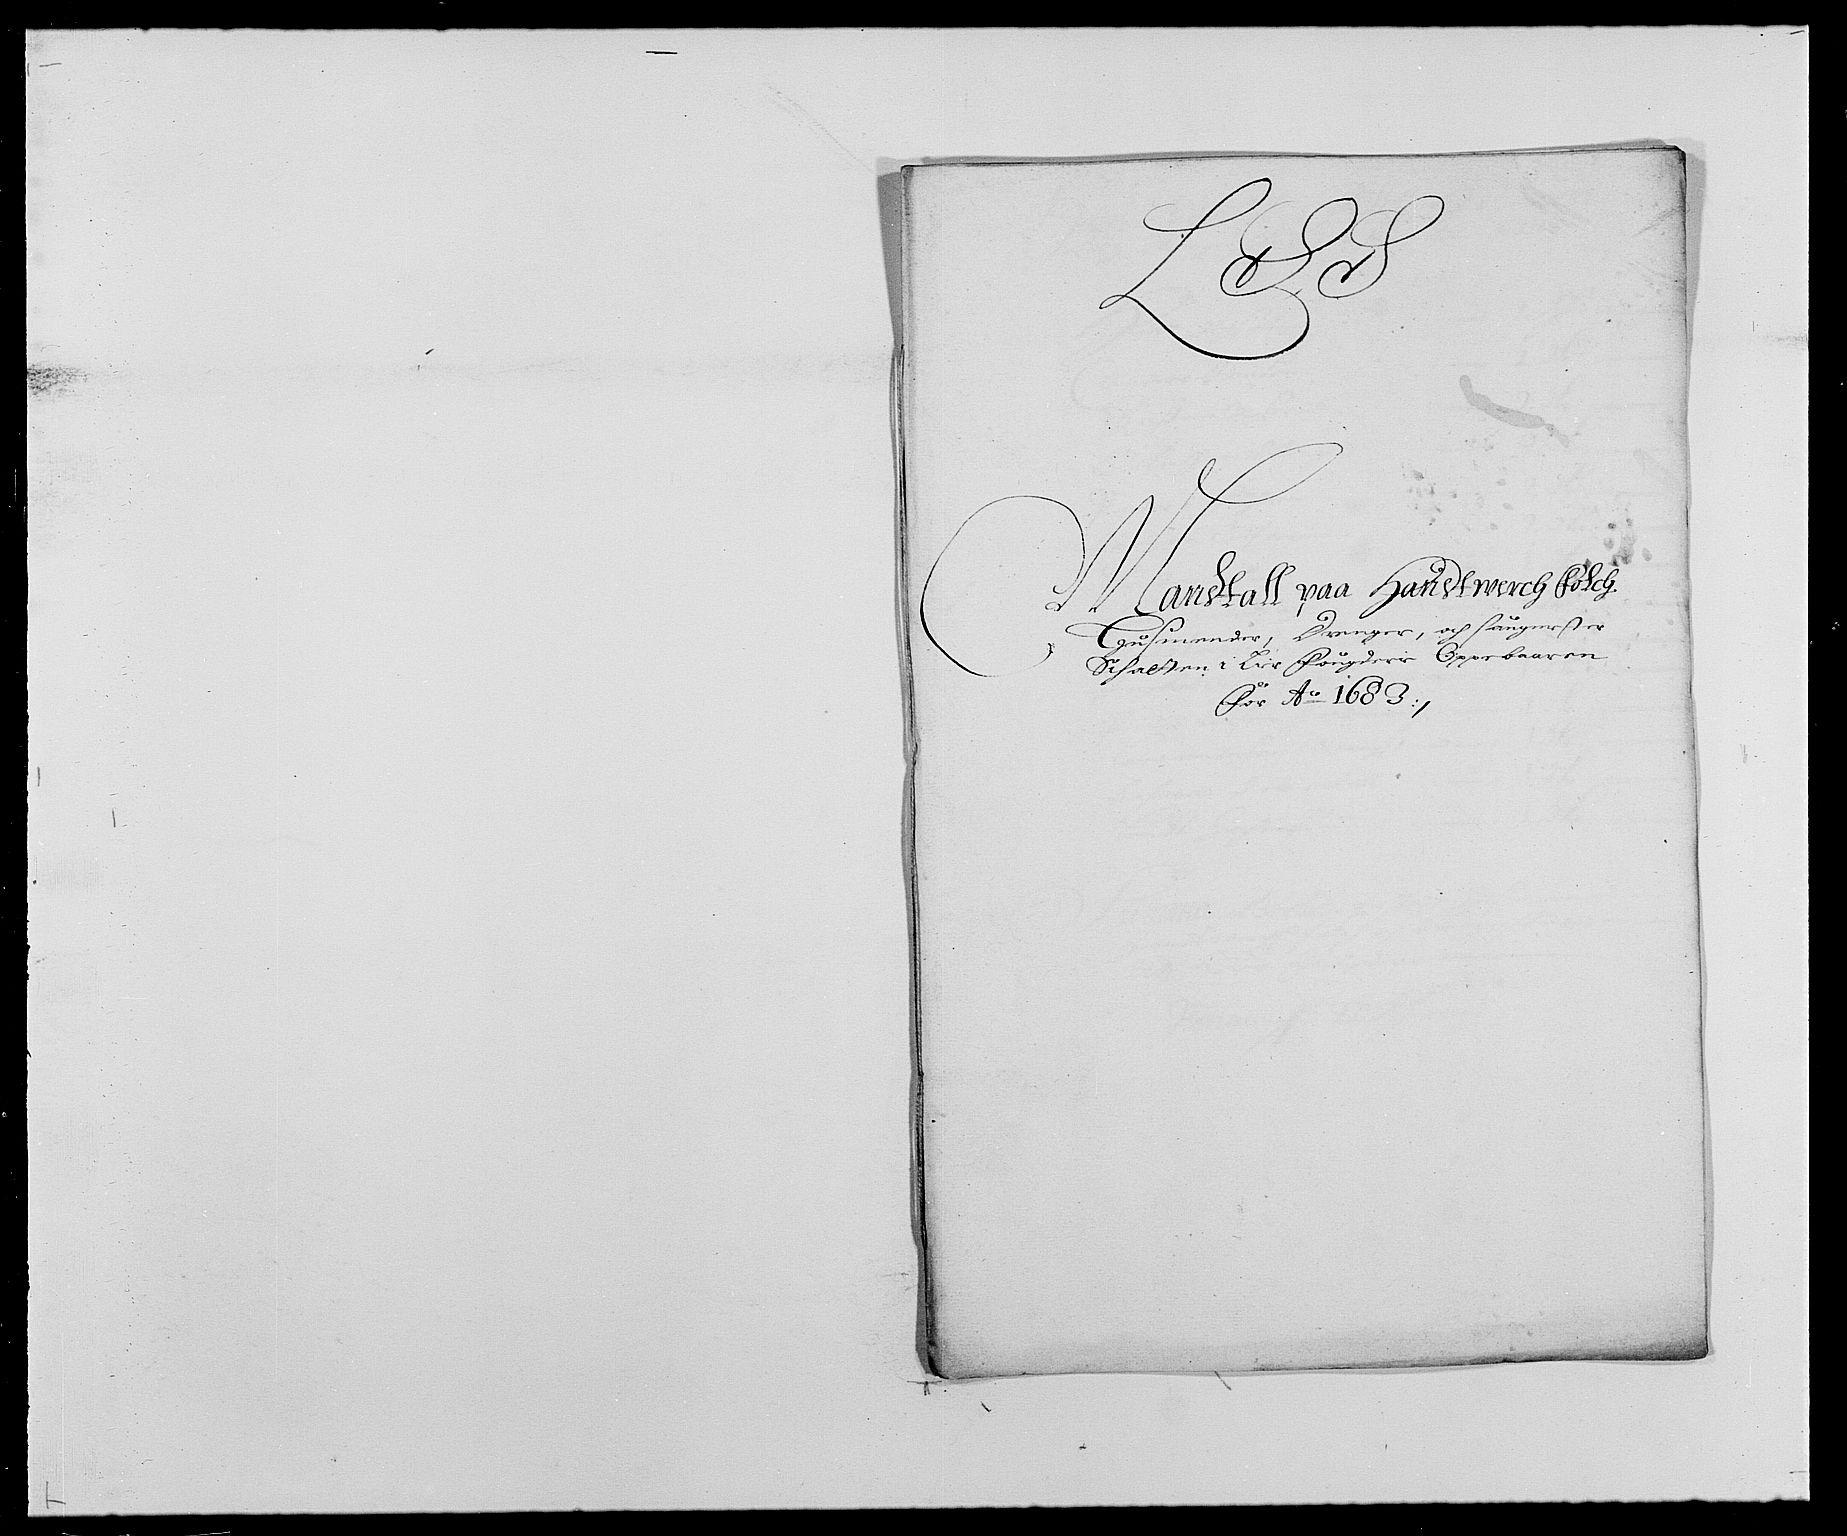 RA, Rentekammeret inntil 1814, Reviderte regnskaper, Fogderegnskap, R27/L1687: Fogderegnskap Lier, 1678-1686, s. 38